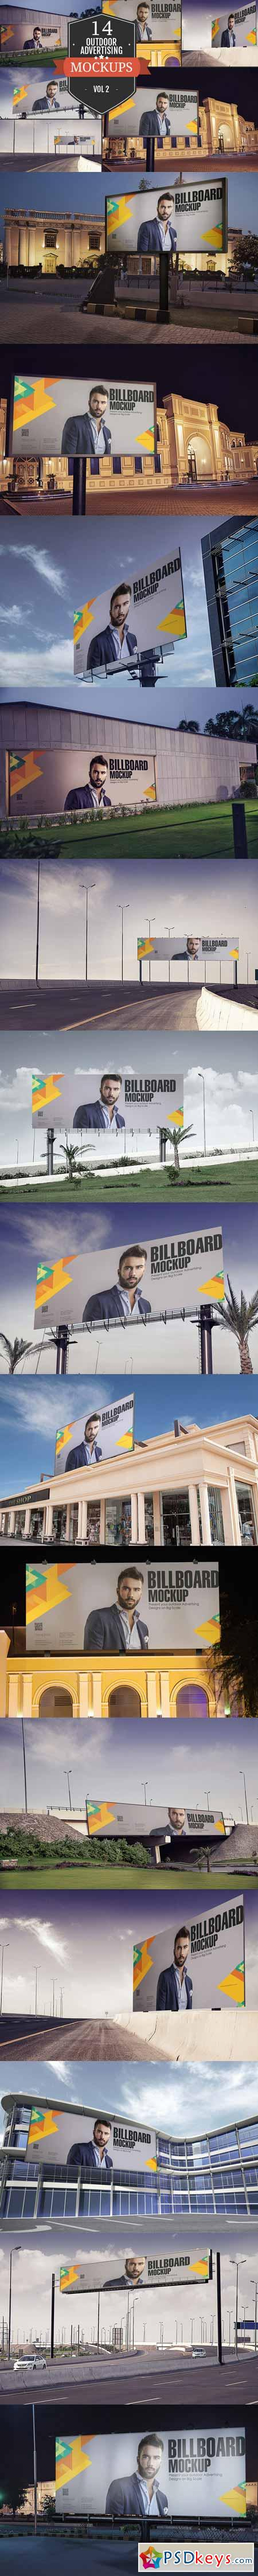 Outdoor Advertising Mockup Vol. 2 370544